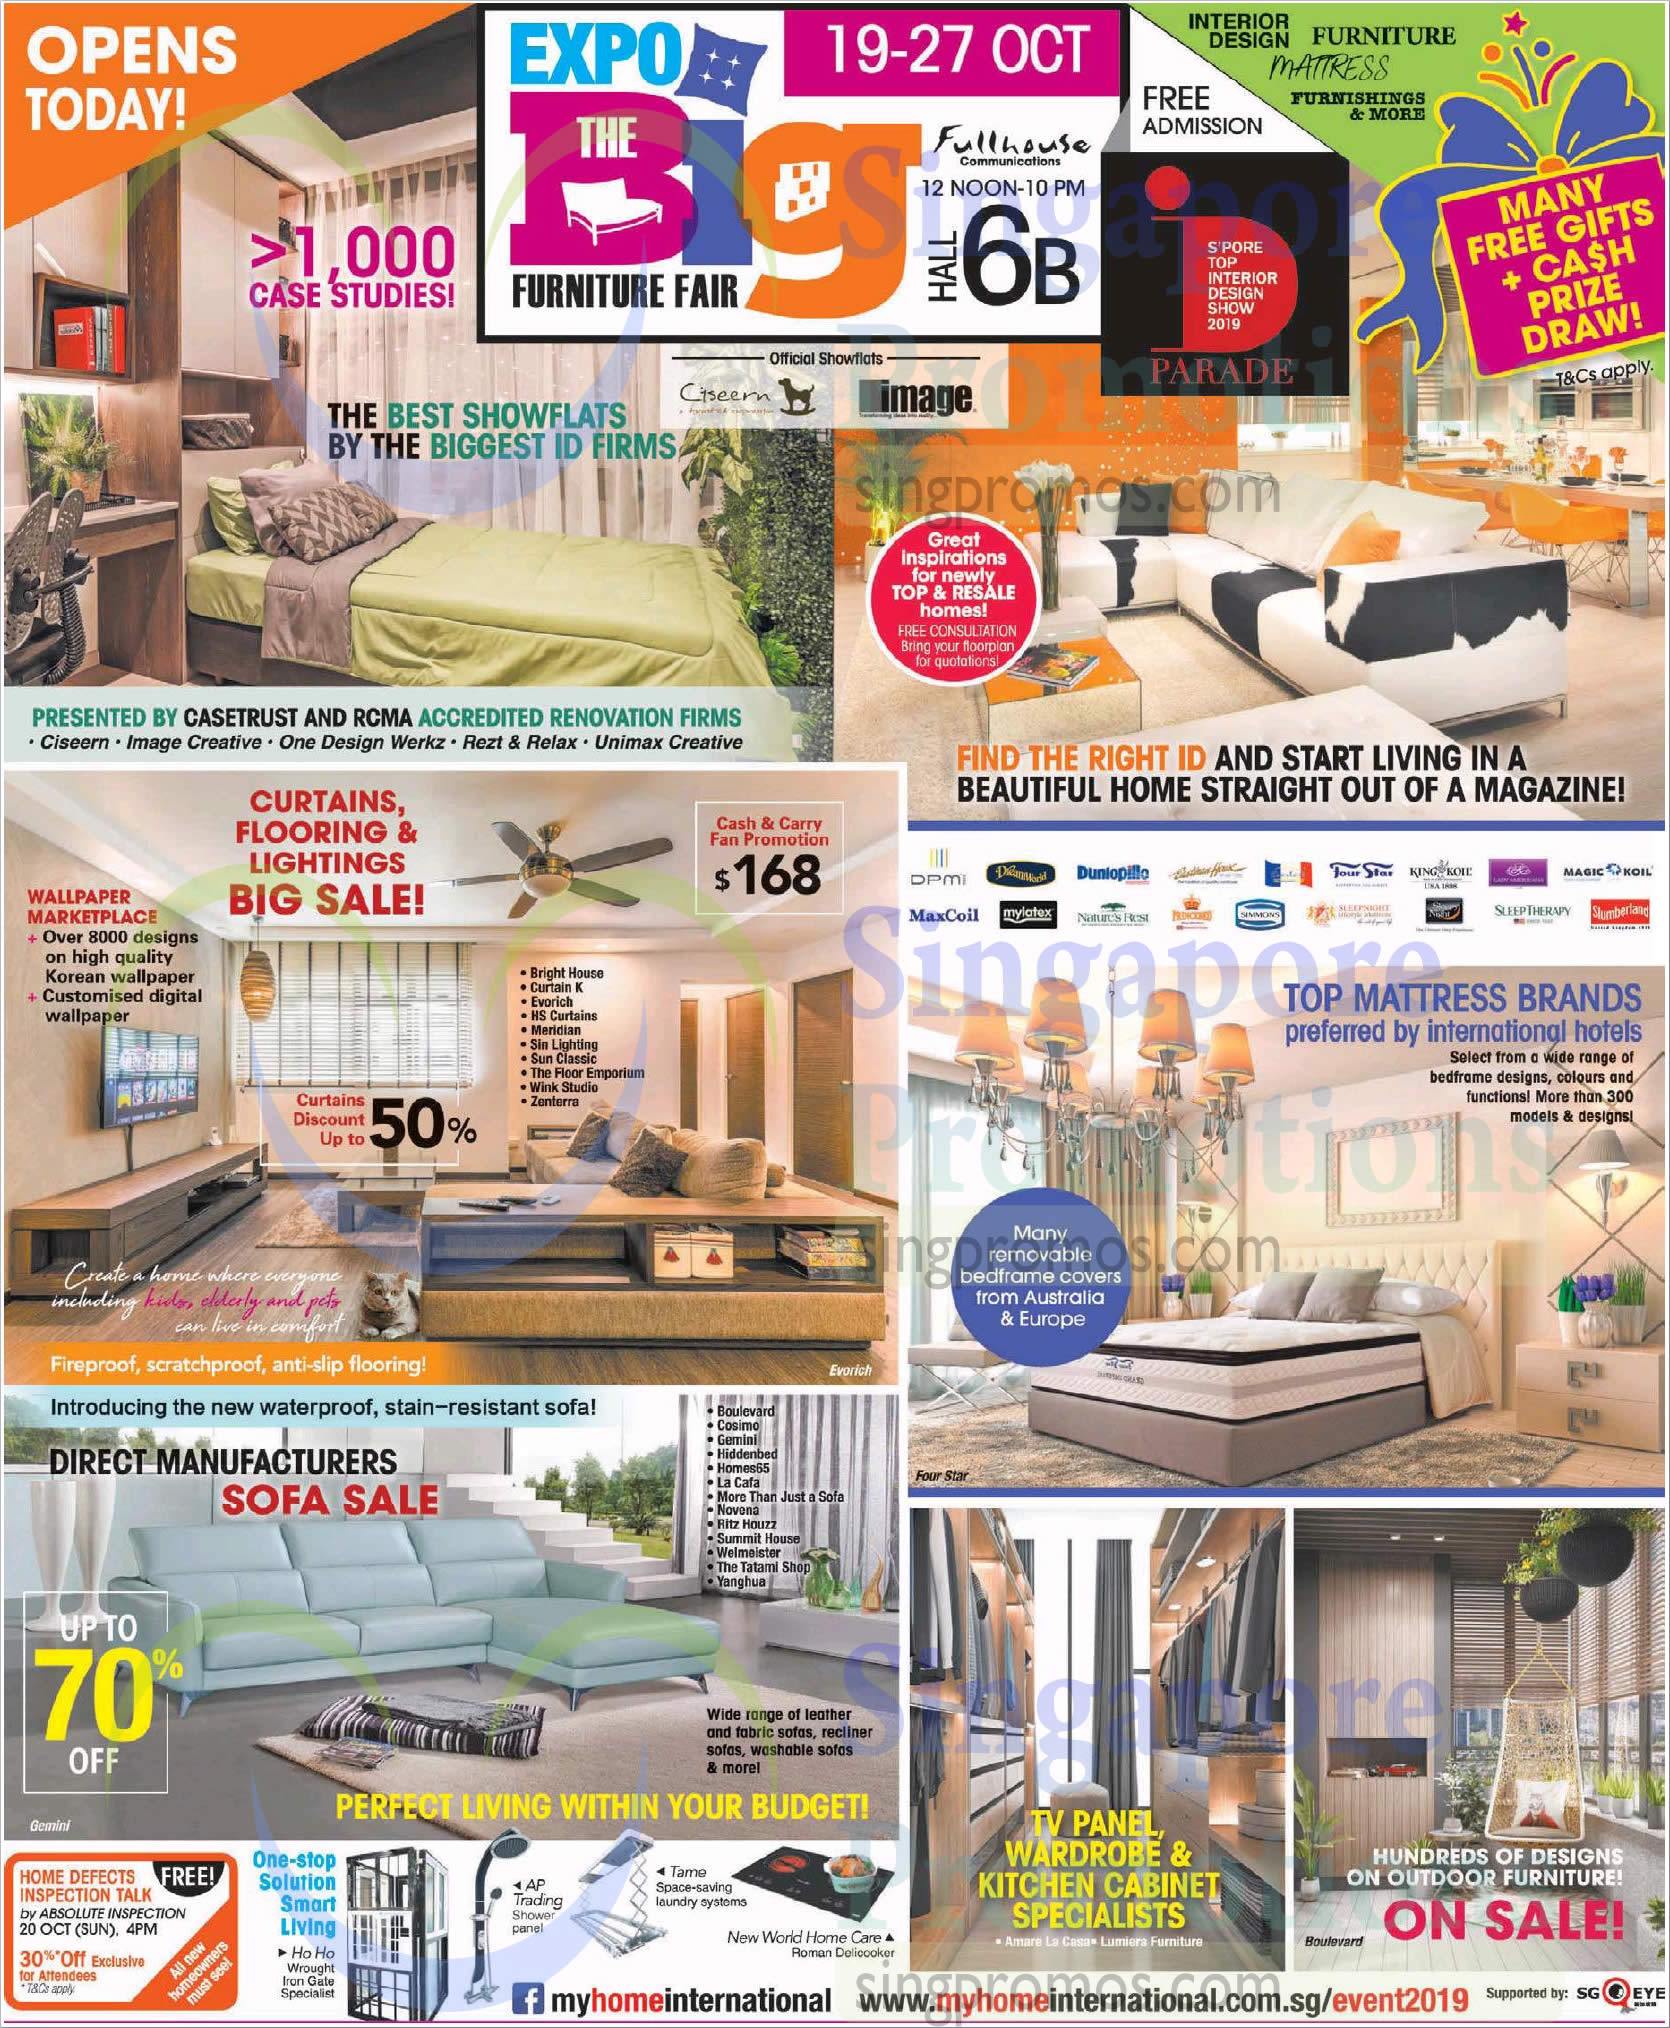 EXPO Big Furniture 19 Oct 2019